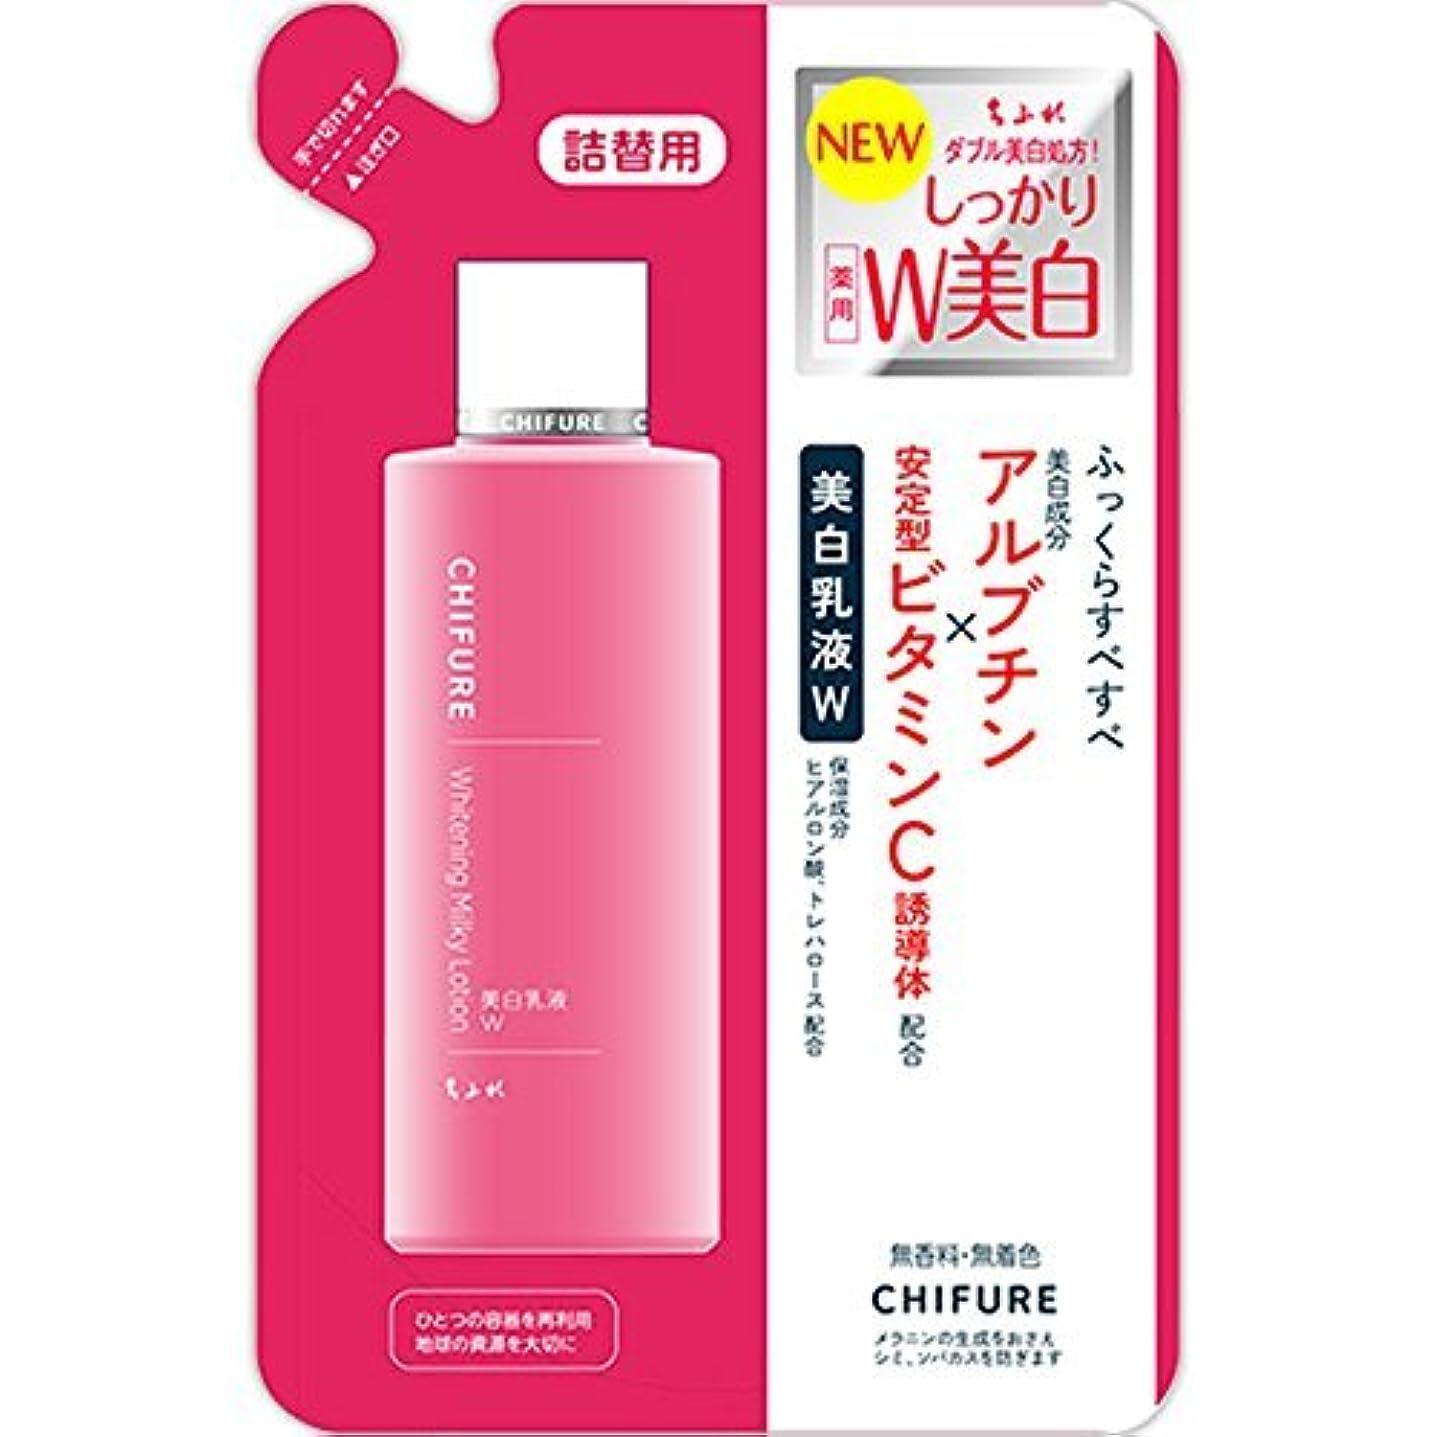 解任第三一月ちふれ化粧品 美白乳液 W 詰替 150ML (医薬部外品)